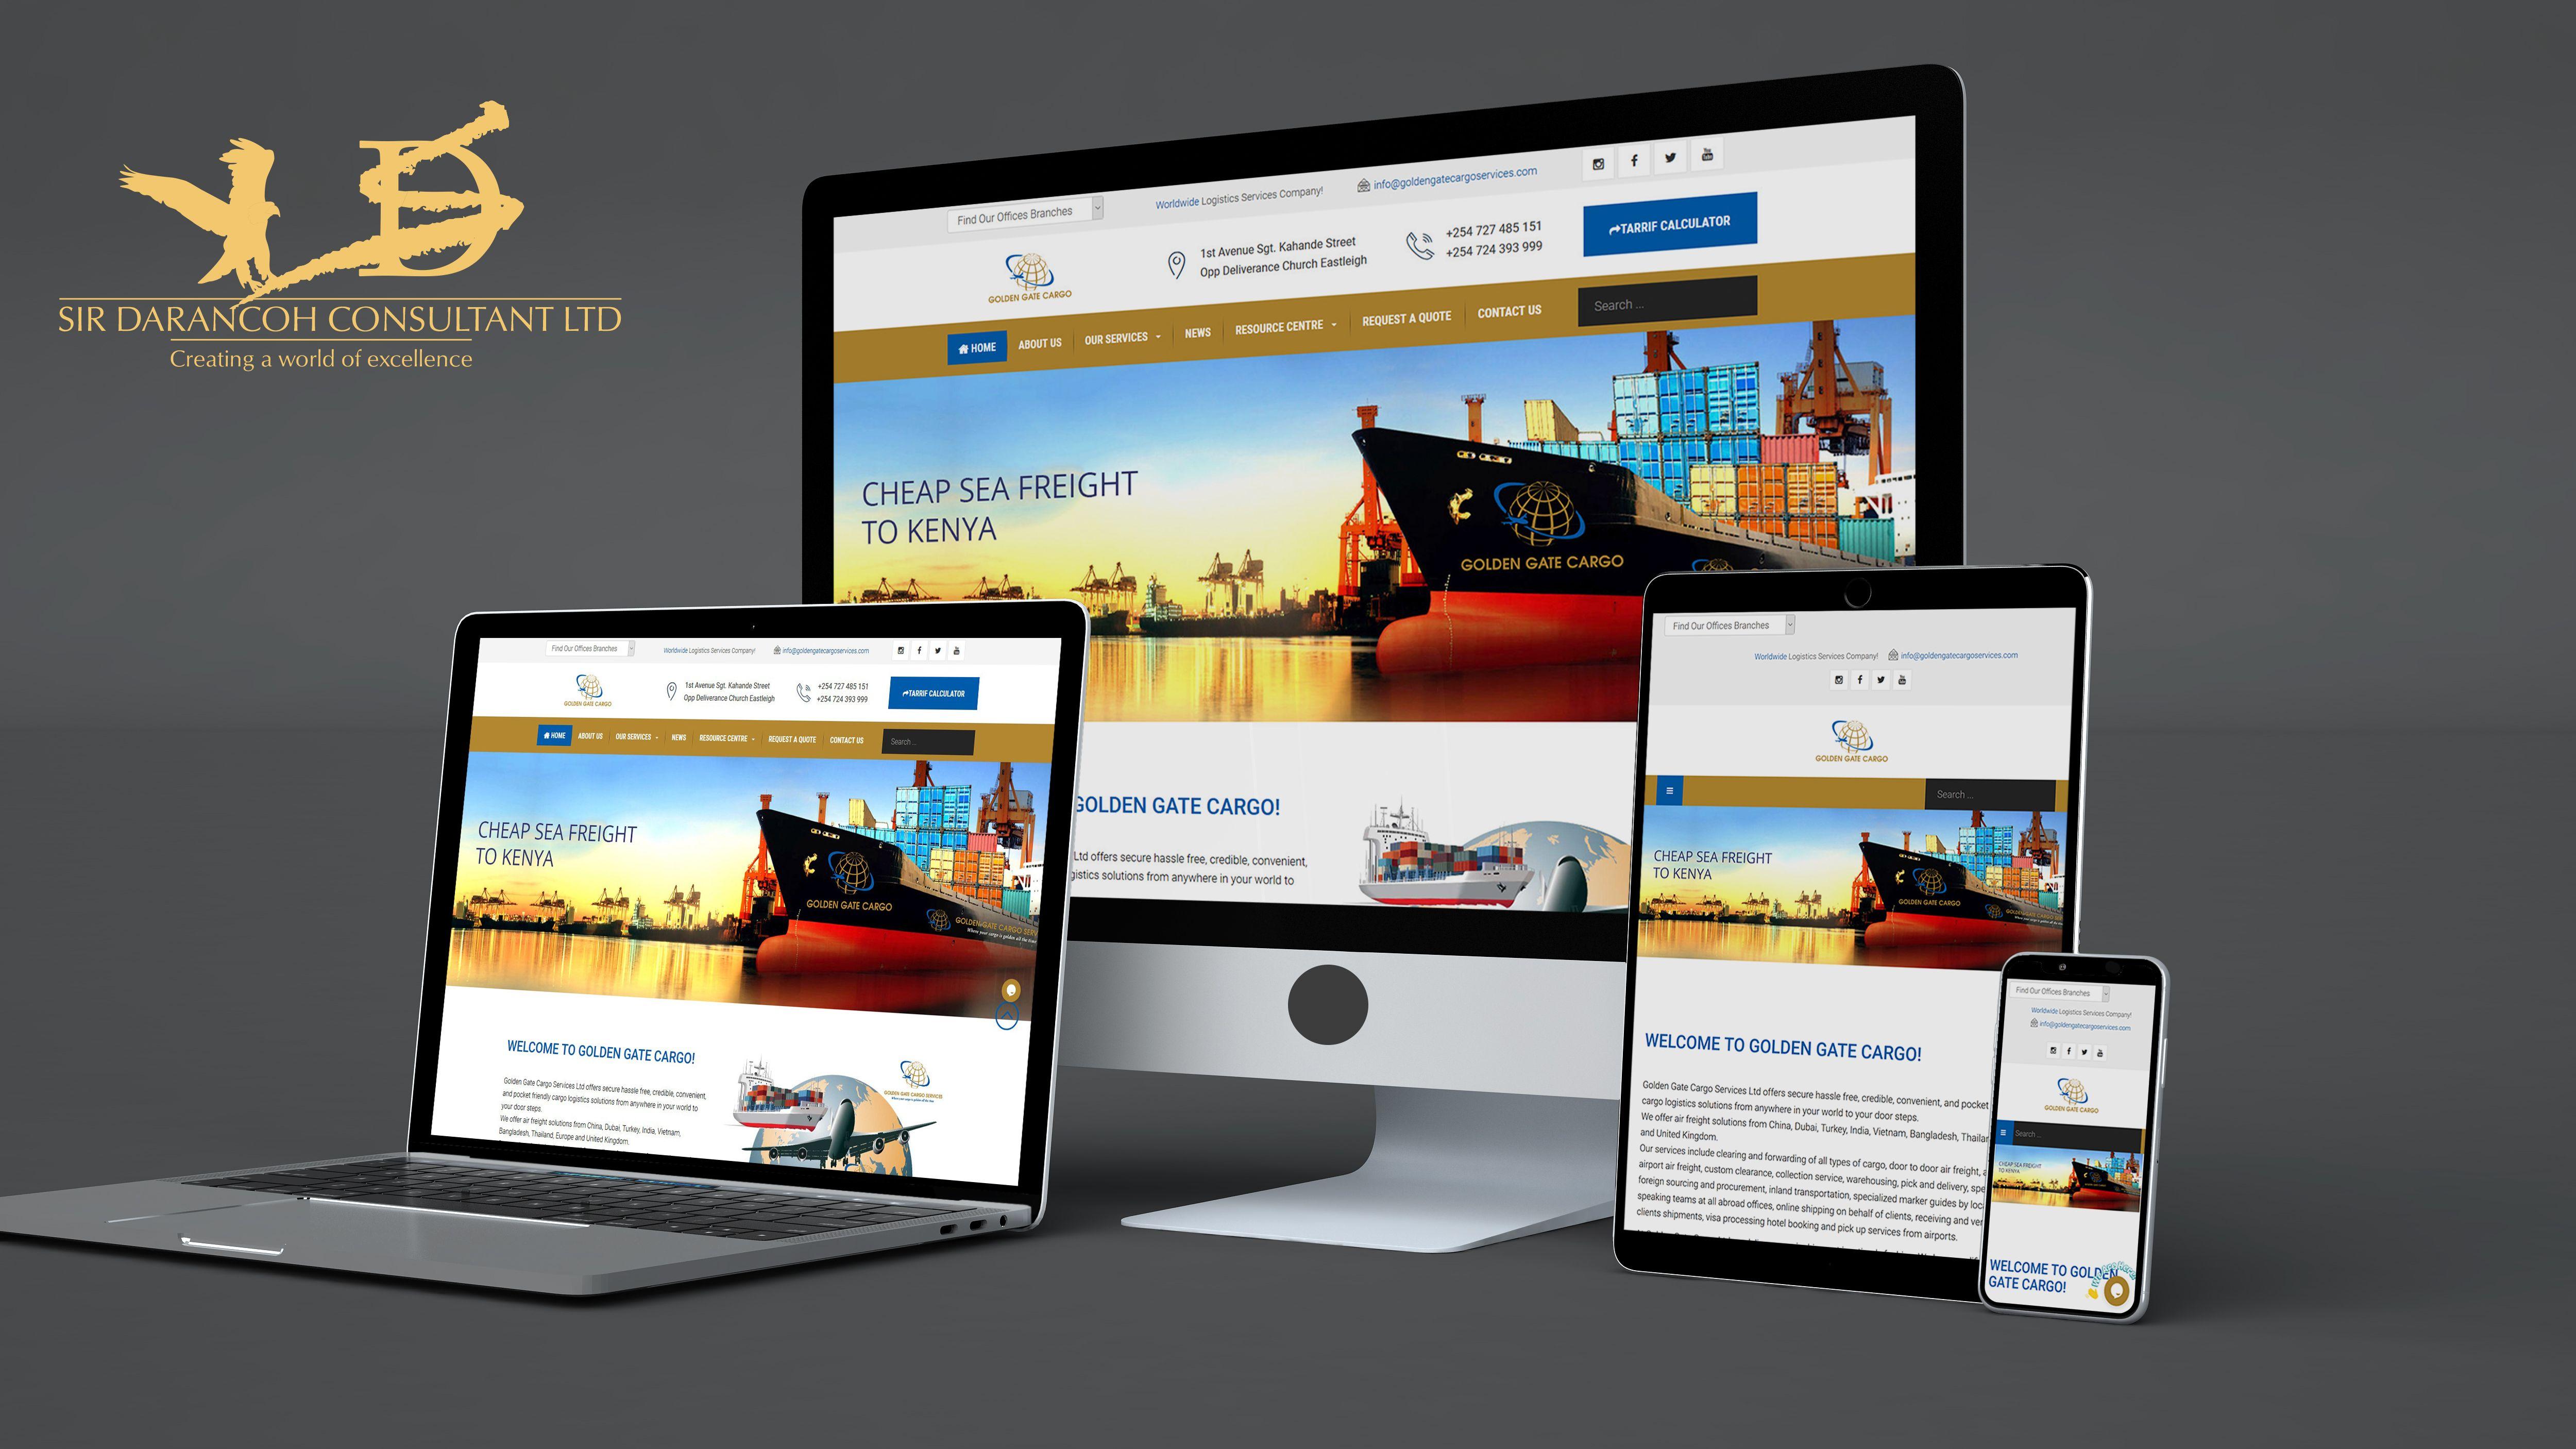 Golden Gates Cargo Limited